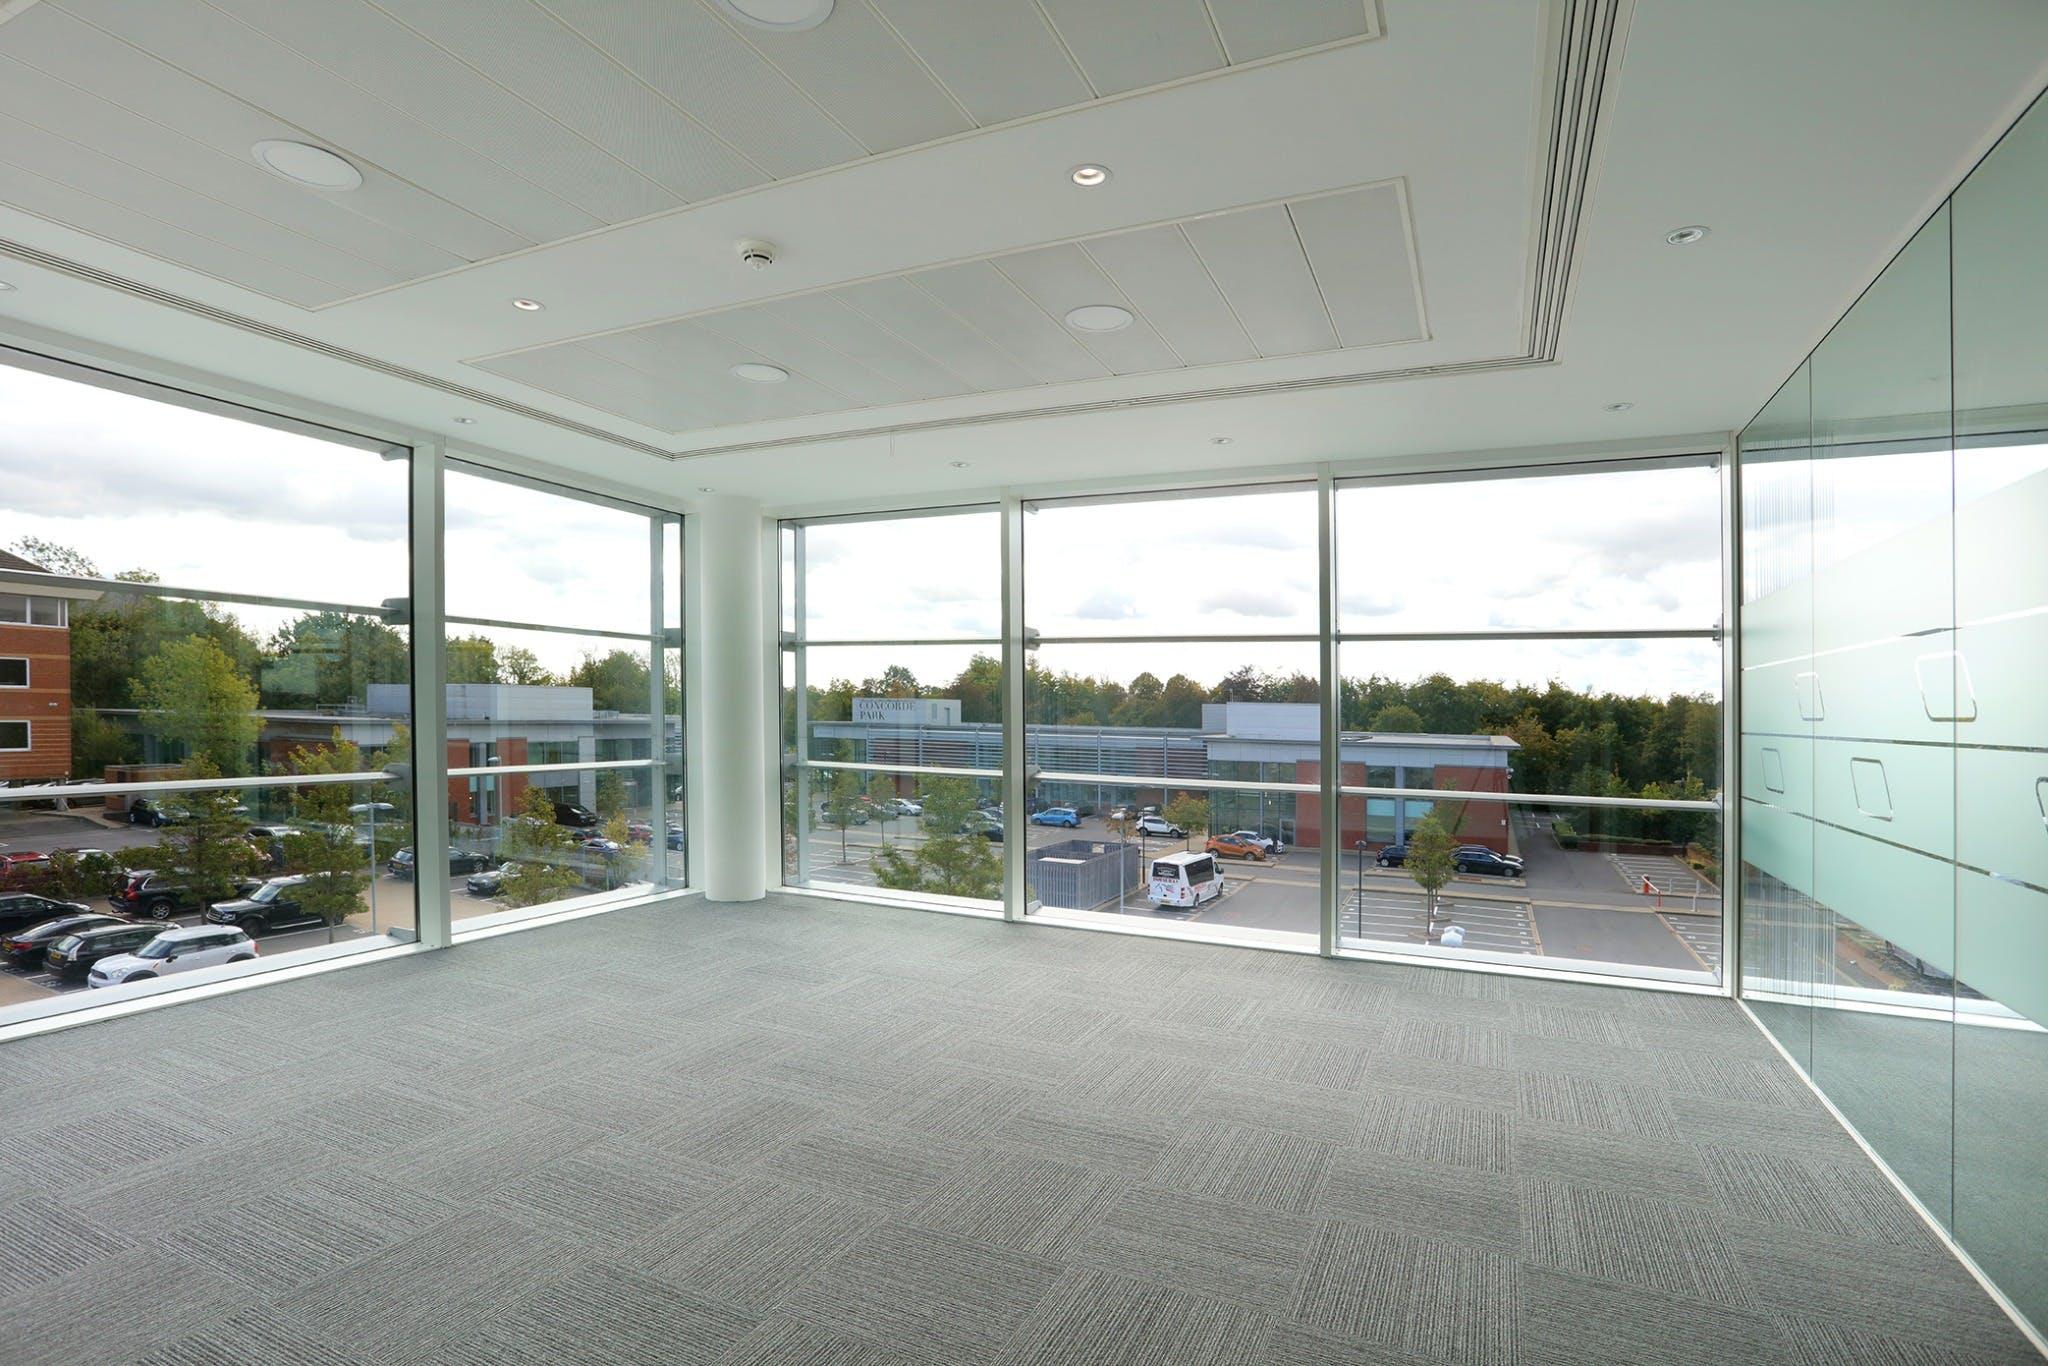 Clarion House, Maidenhead, Offices To Let - 9a970836c956bd1e4109fc04ac39b3a3c4d8214e.jpg